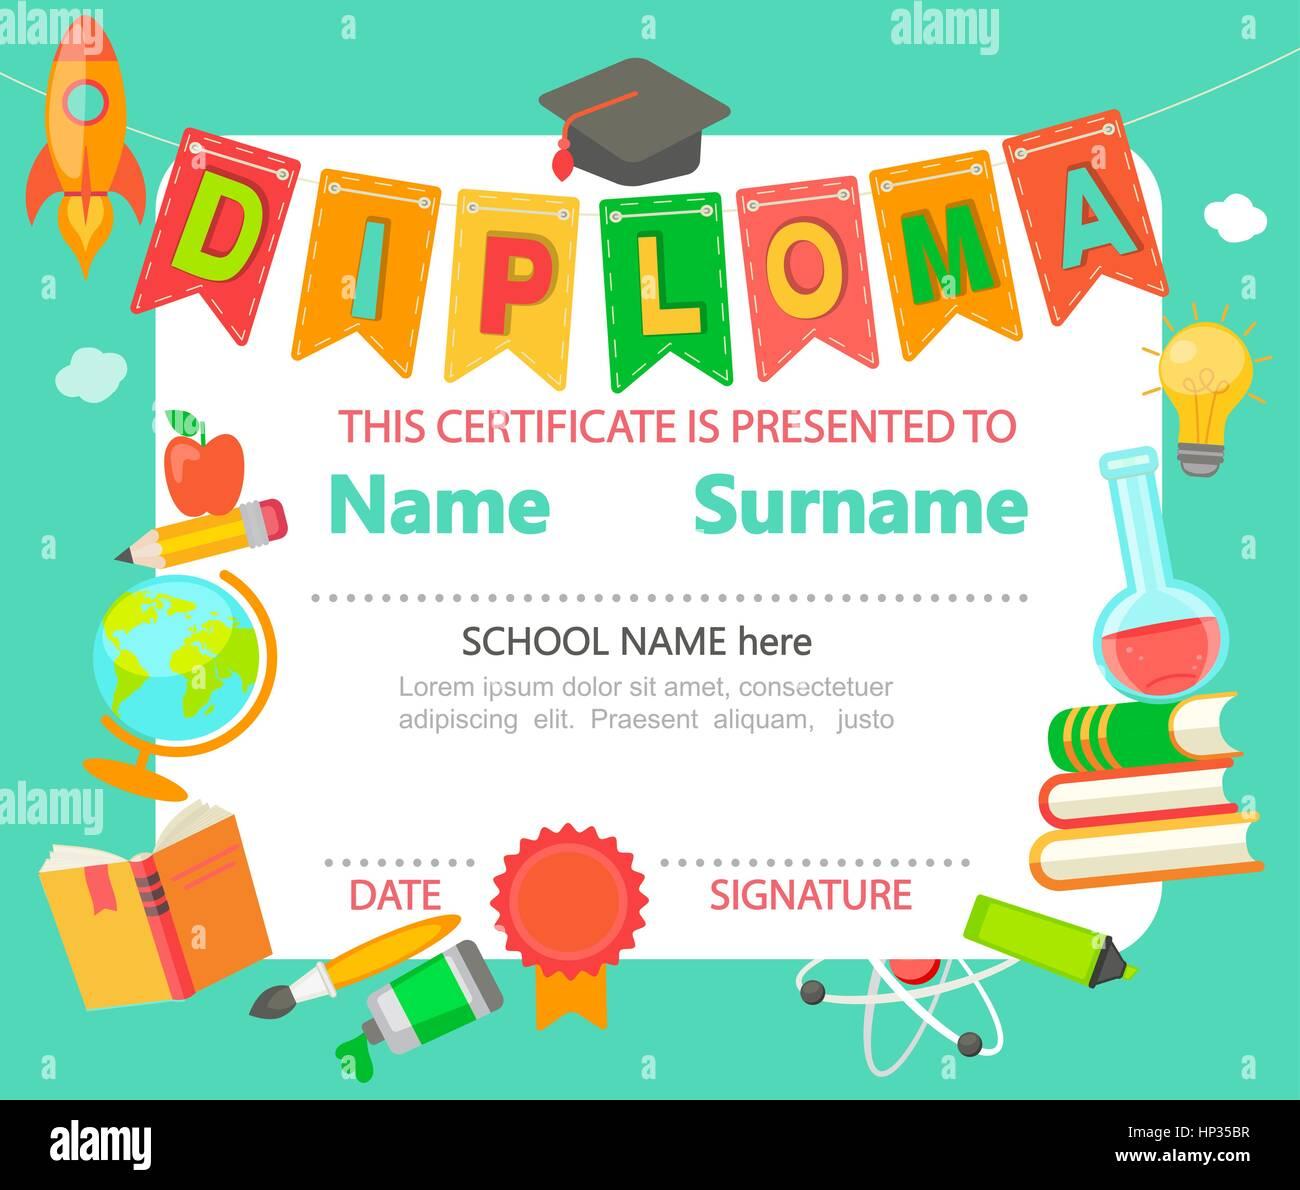 Certificate Achievement Stockfotos & Certificate Achievement Bilder ...